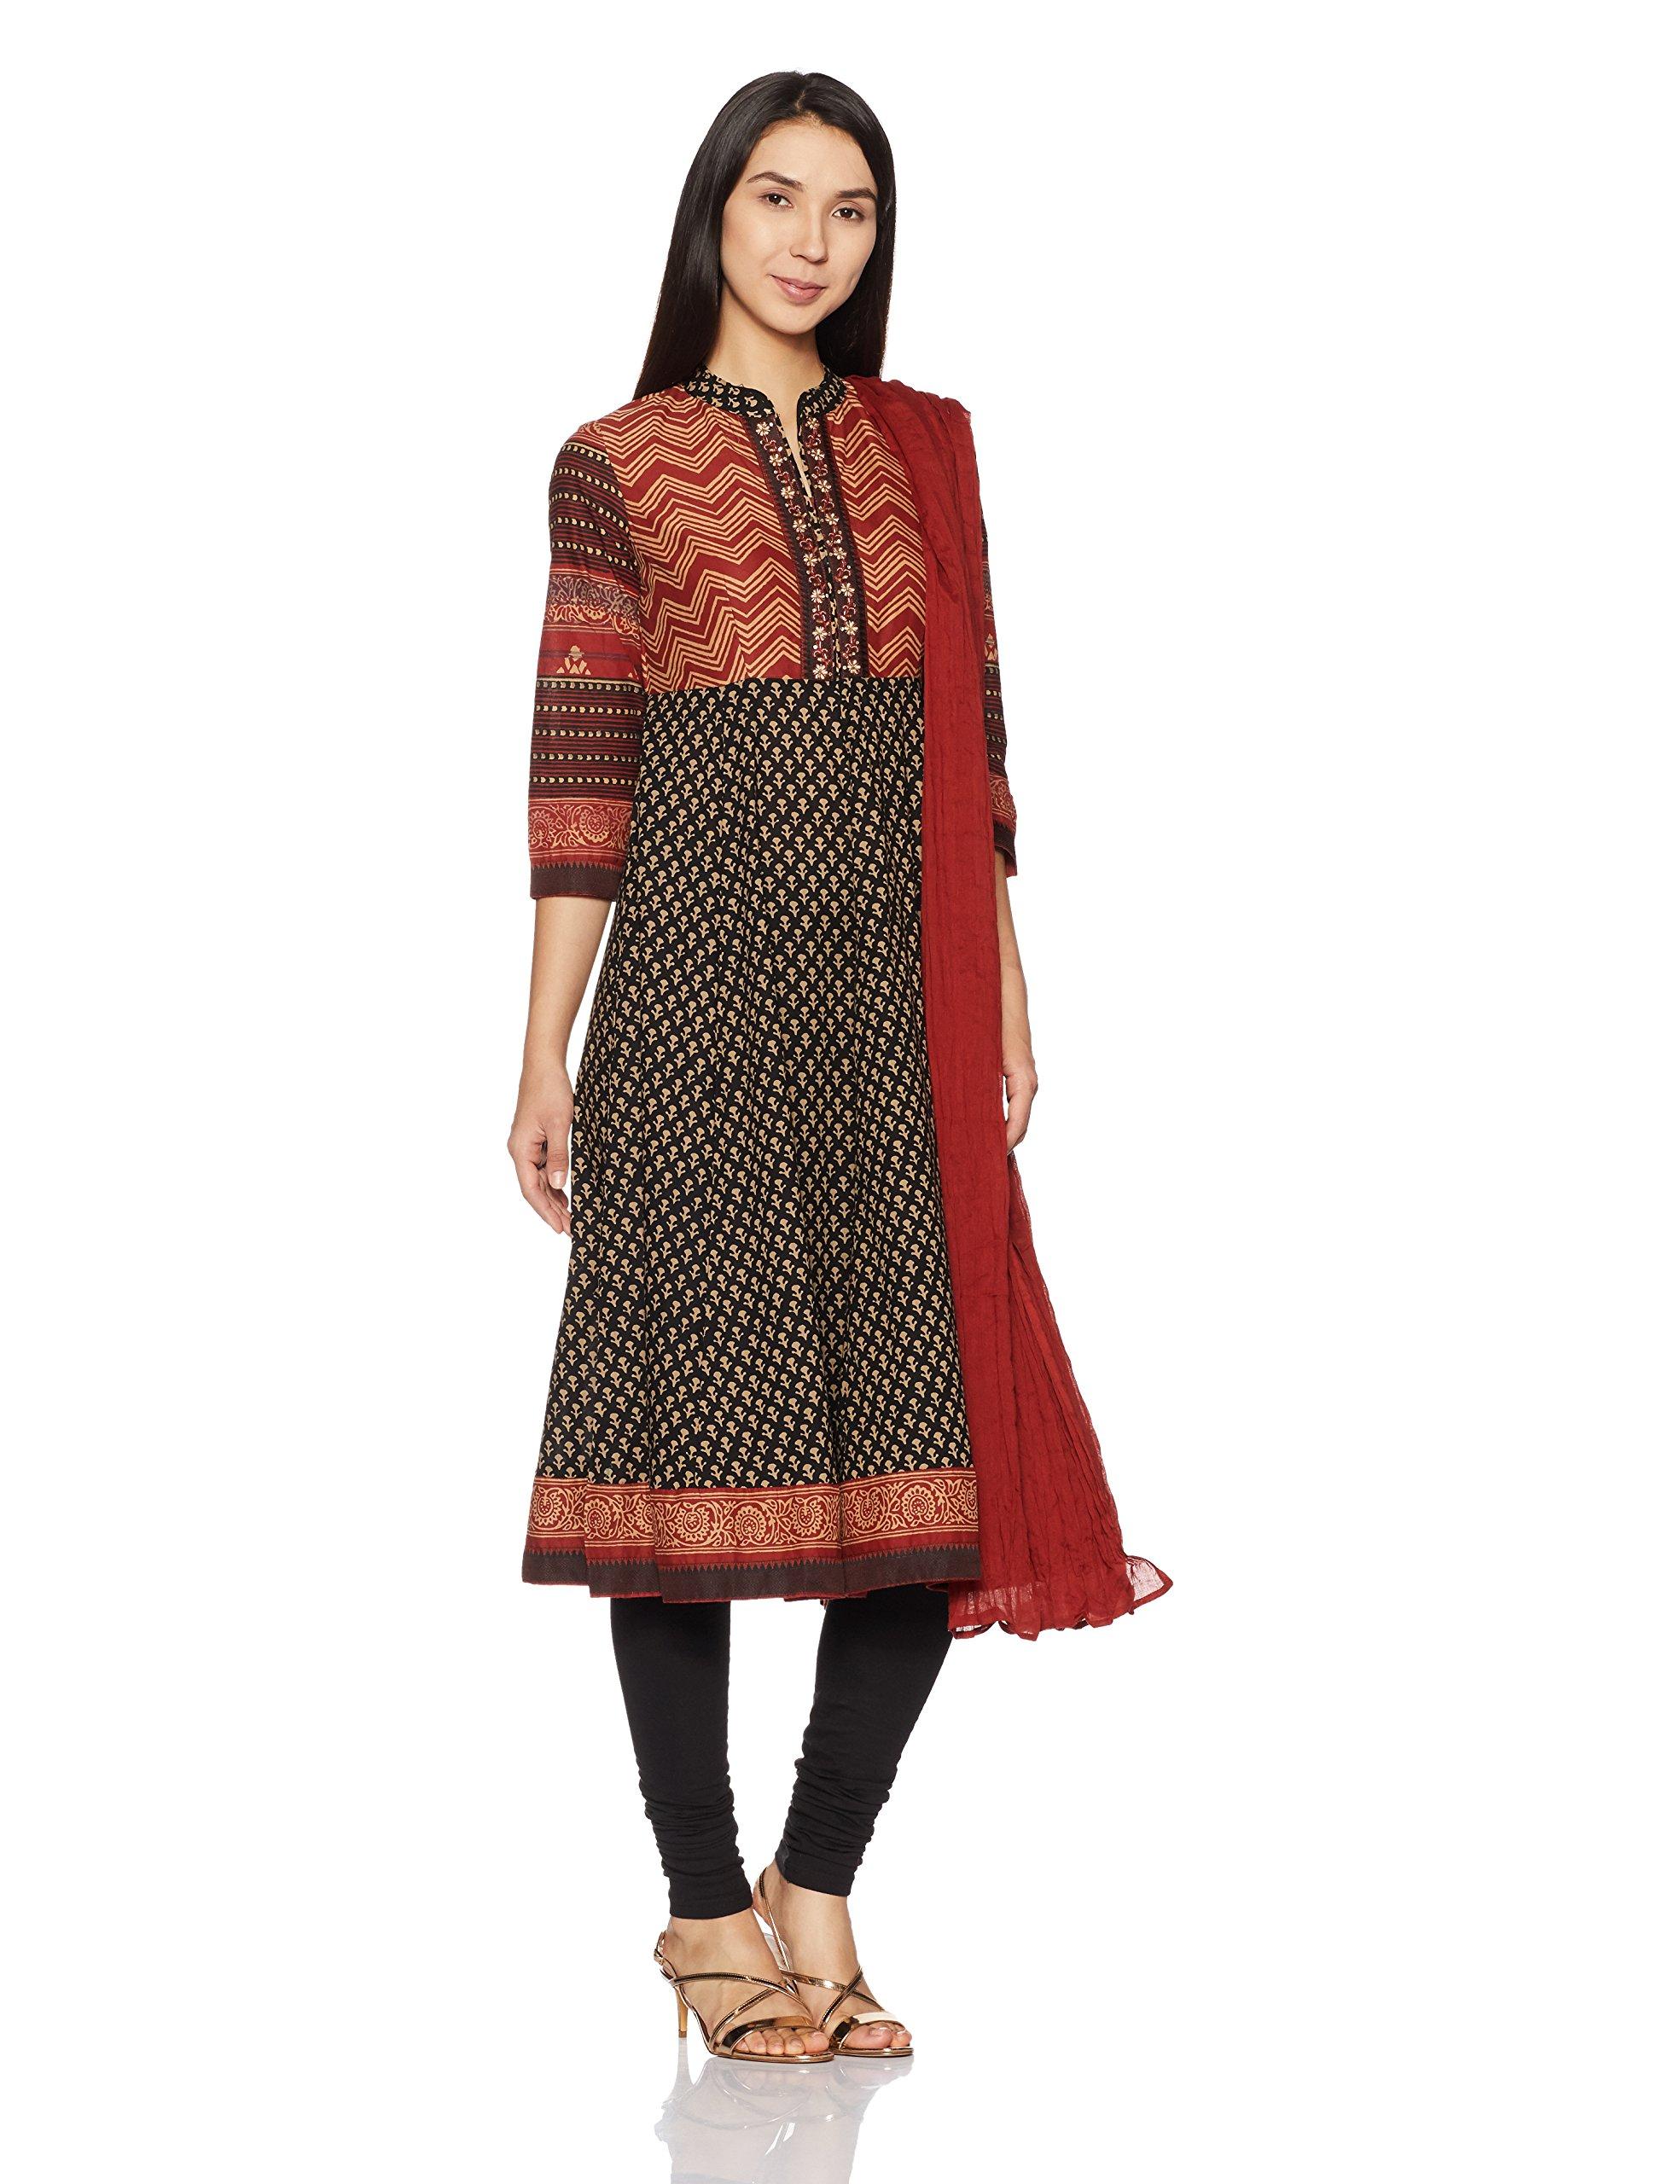 BIBA Women's Anarkali Cotton Suit Set 36 Red & Black